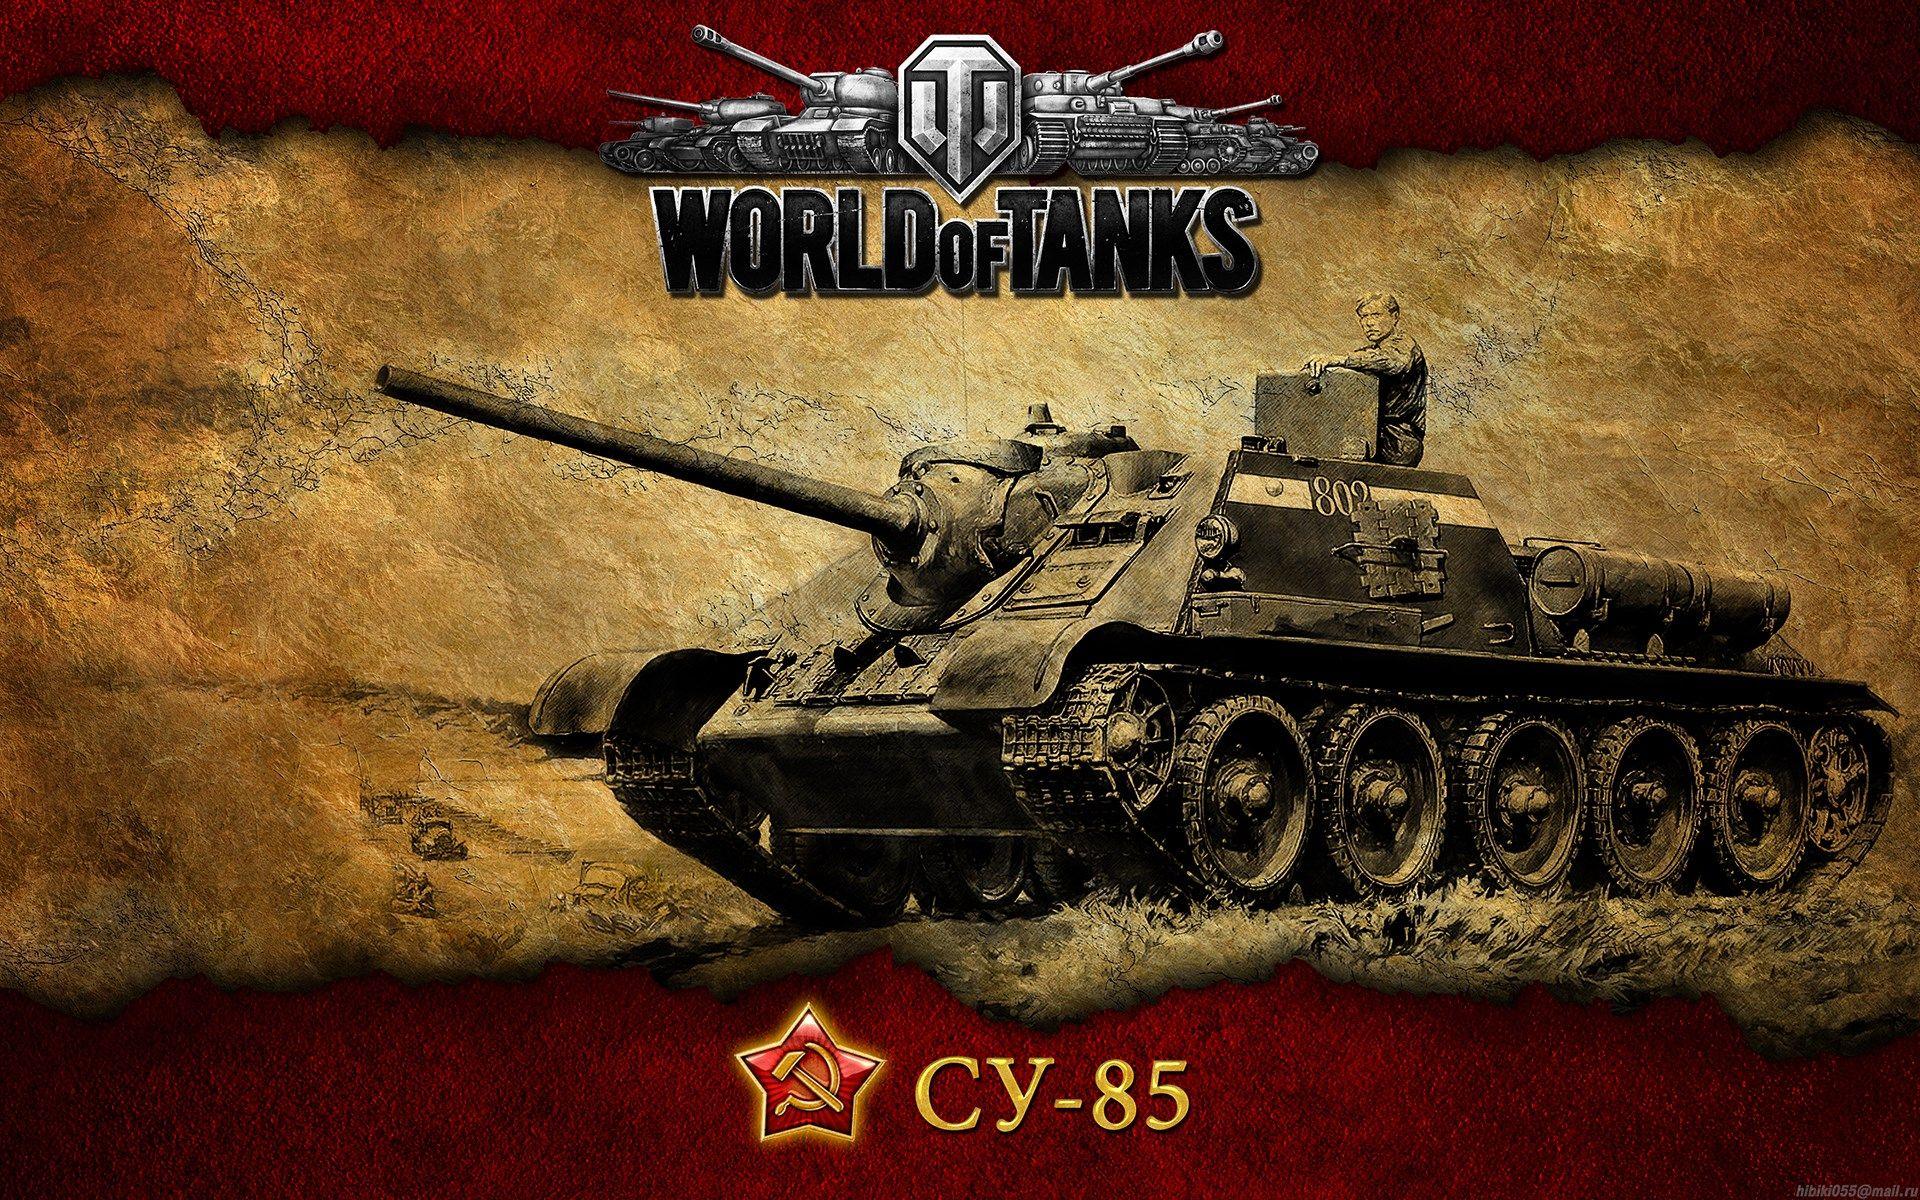 world of tanks Background hd 1920x1200 World of tanks